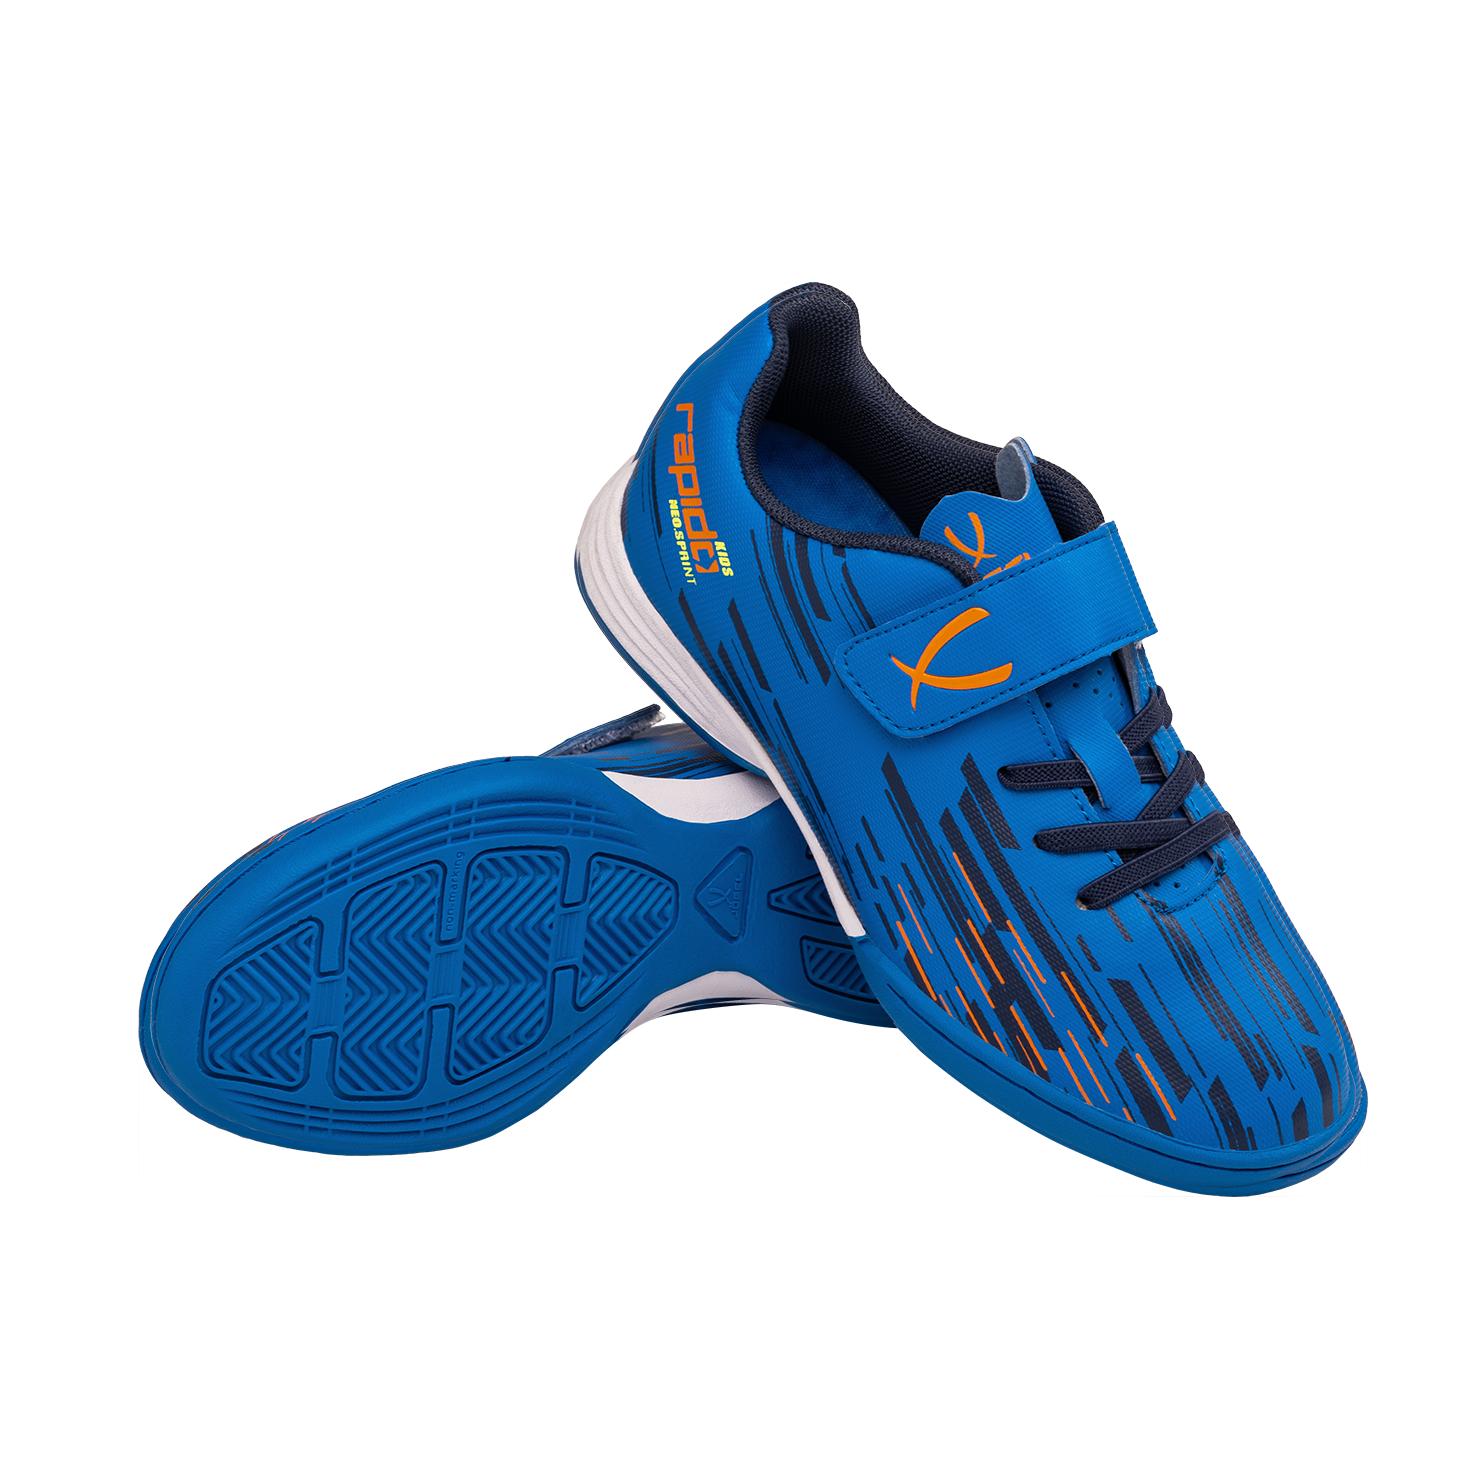 JOGEL Rapido JSH101-K blue